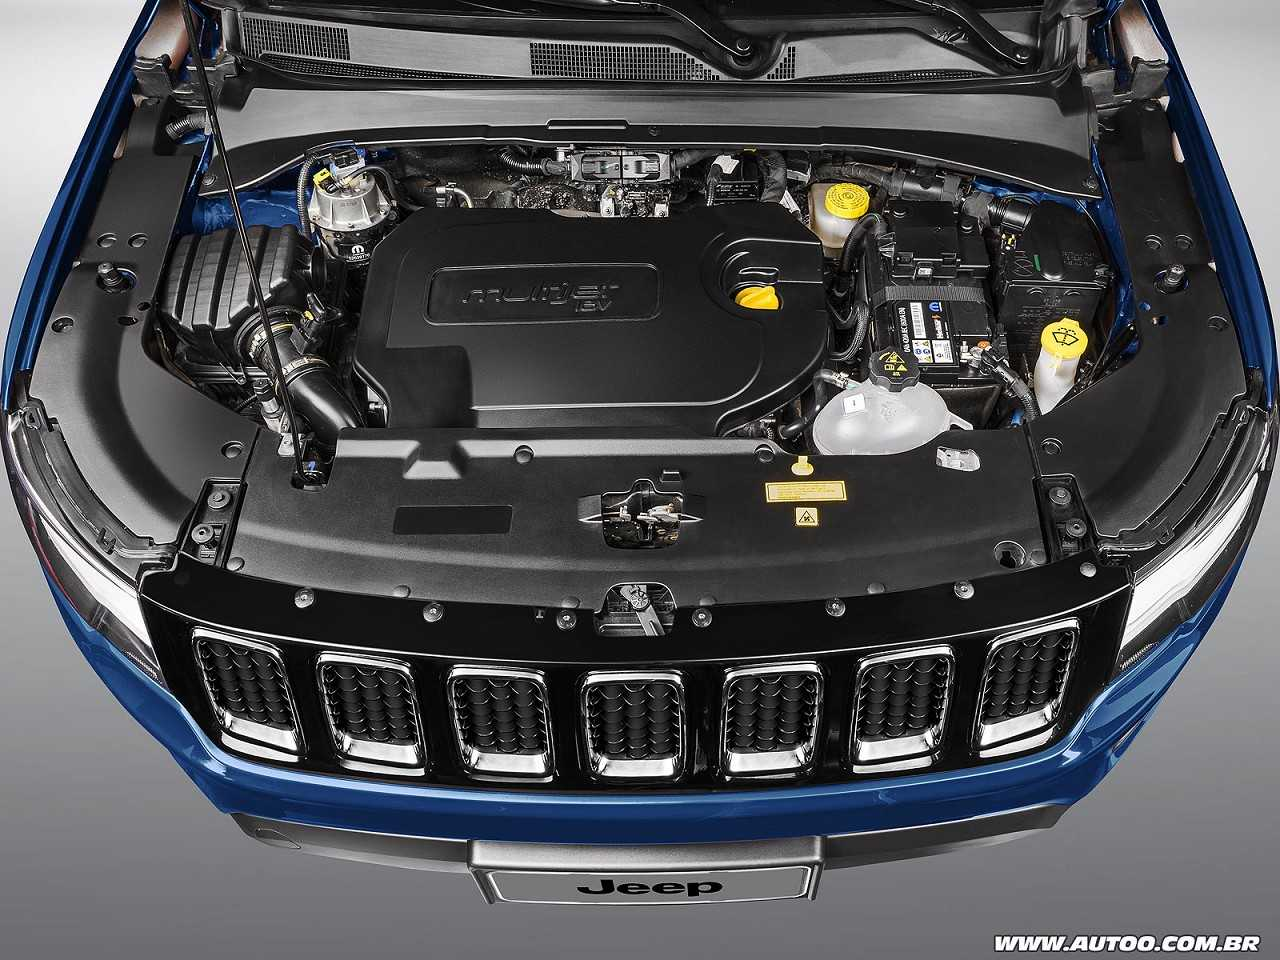 JeepCompass 2017 - motor